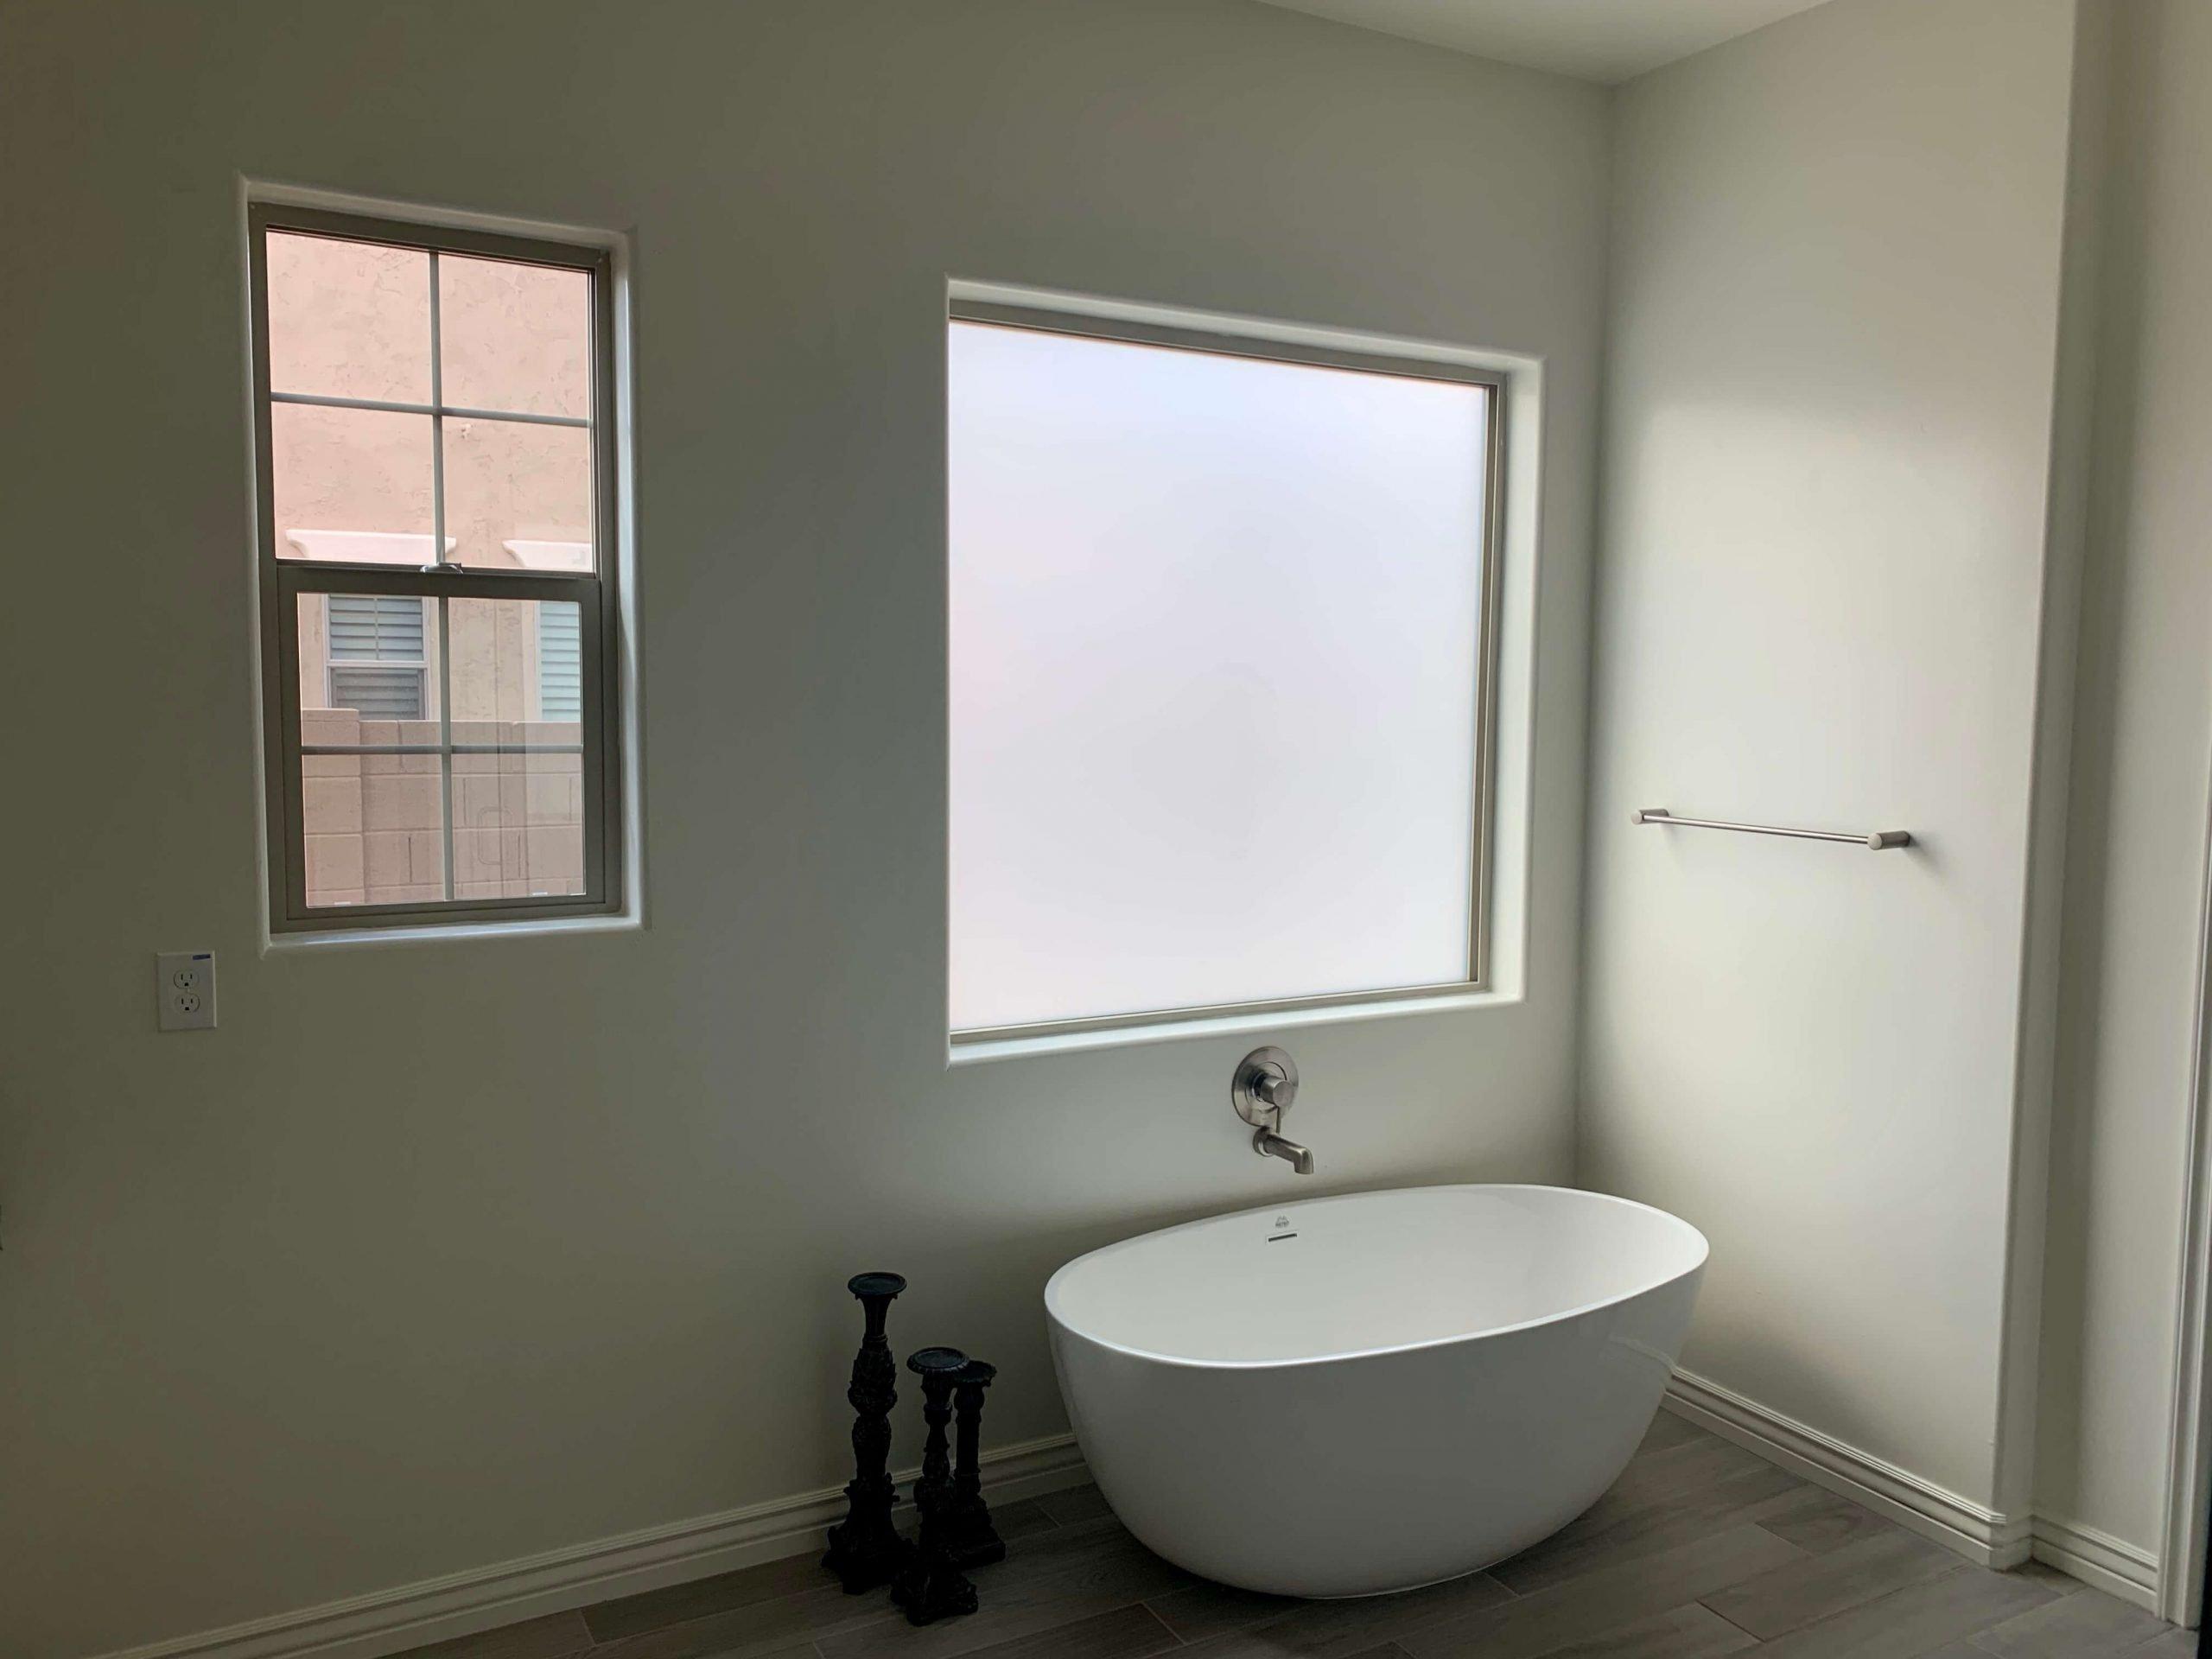 Bathroom Privacy Window Film